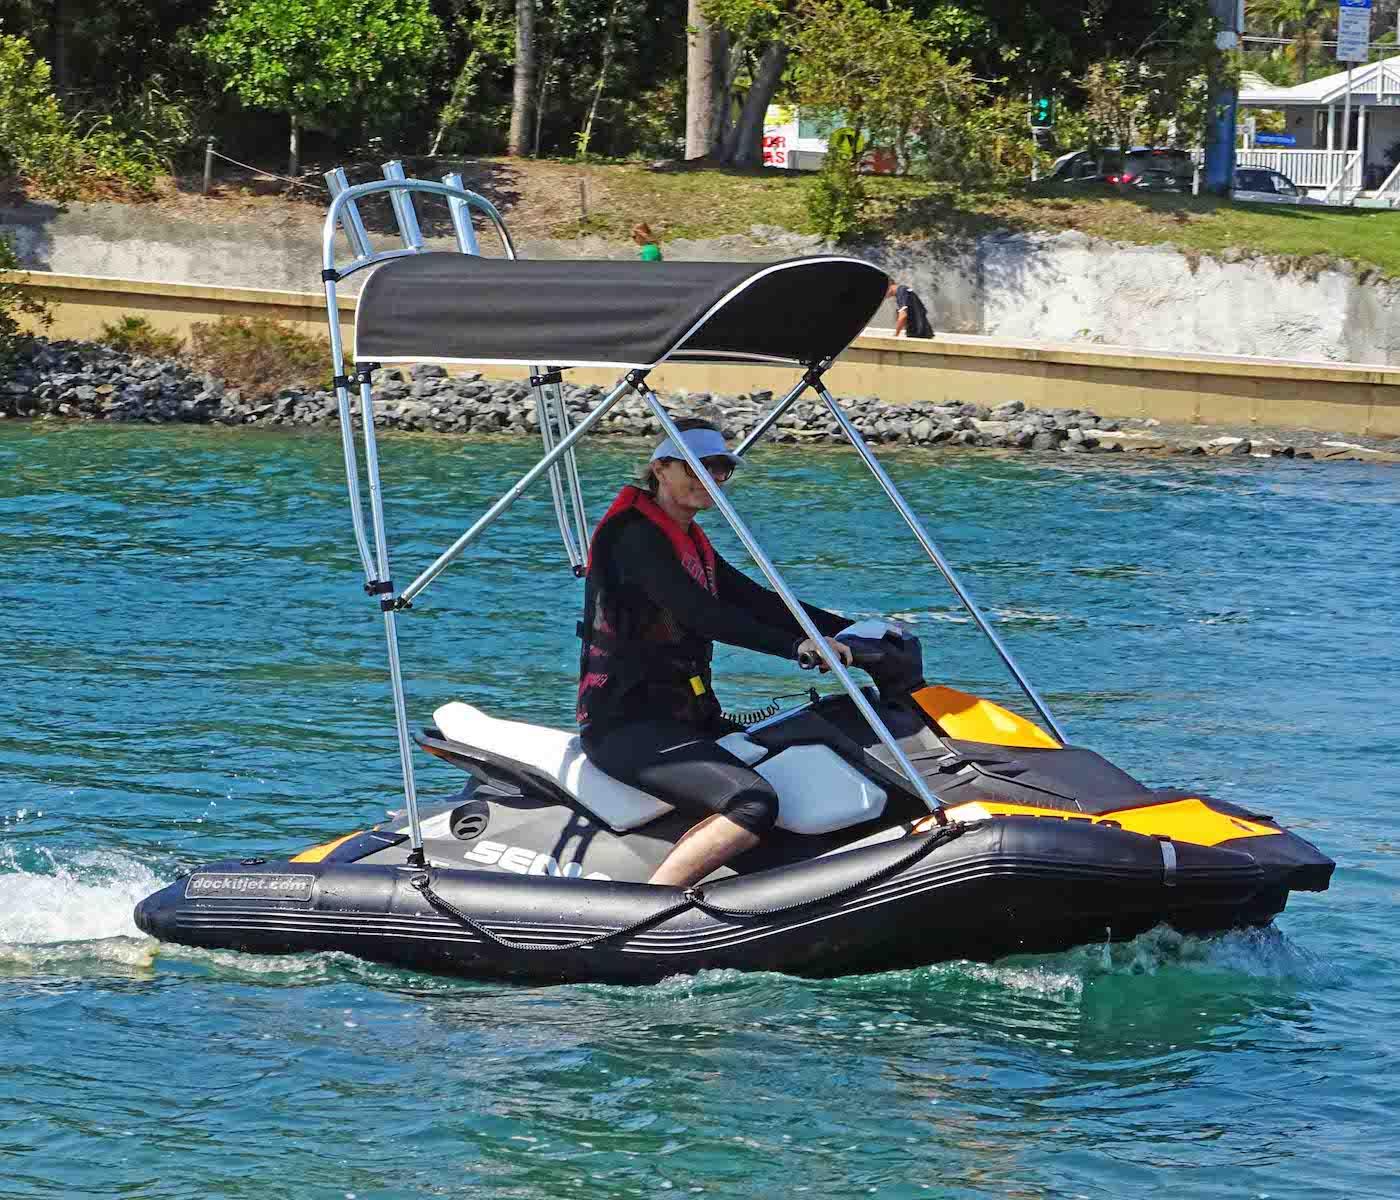 hight resolution of dockitjet inflatable rib kit with bimini